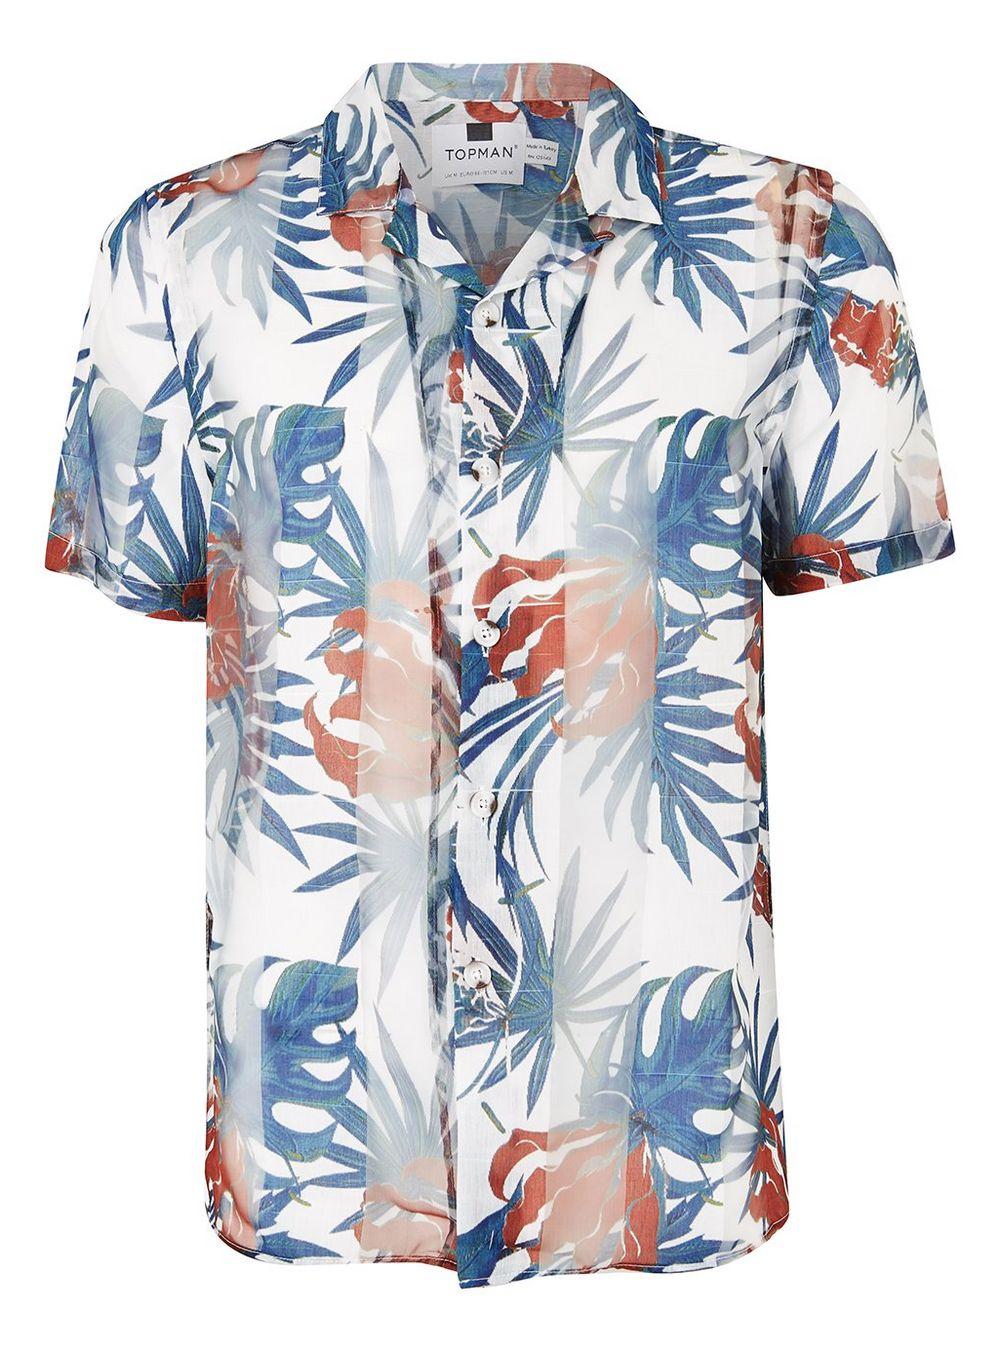 Palm print shirt - £35 at Topman